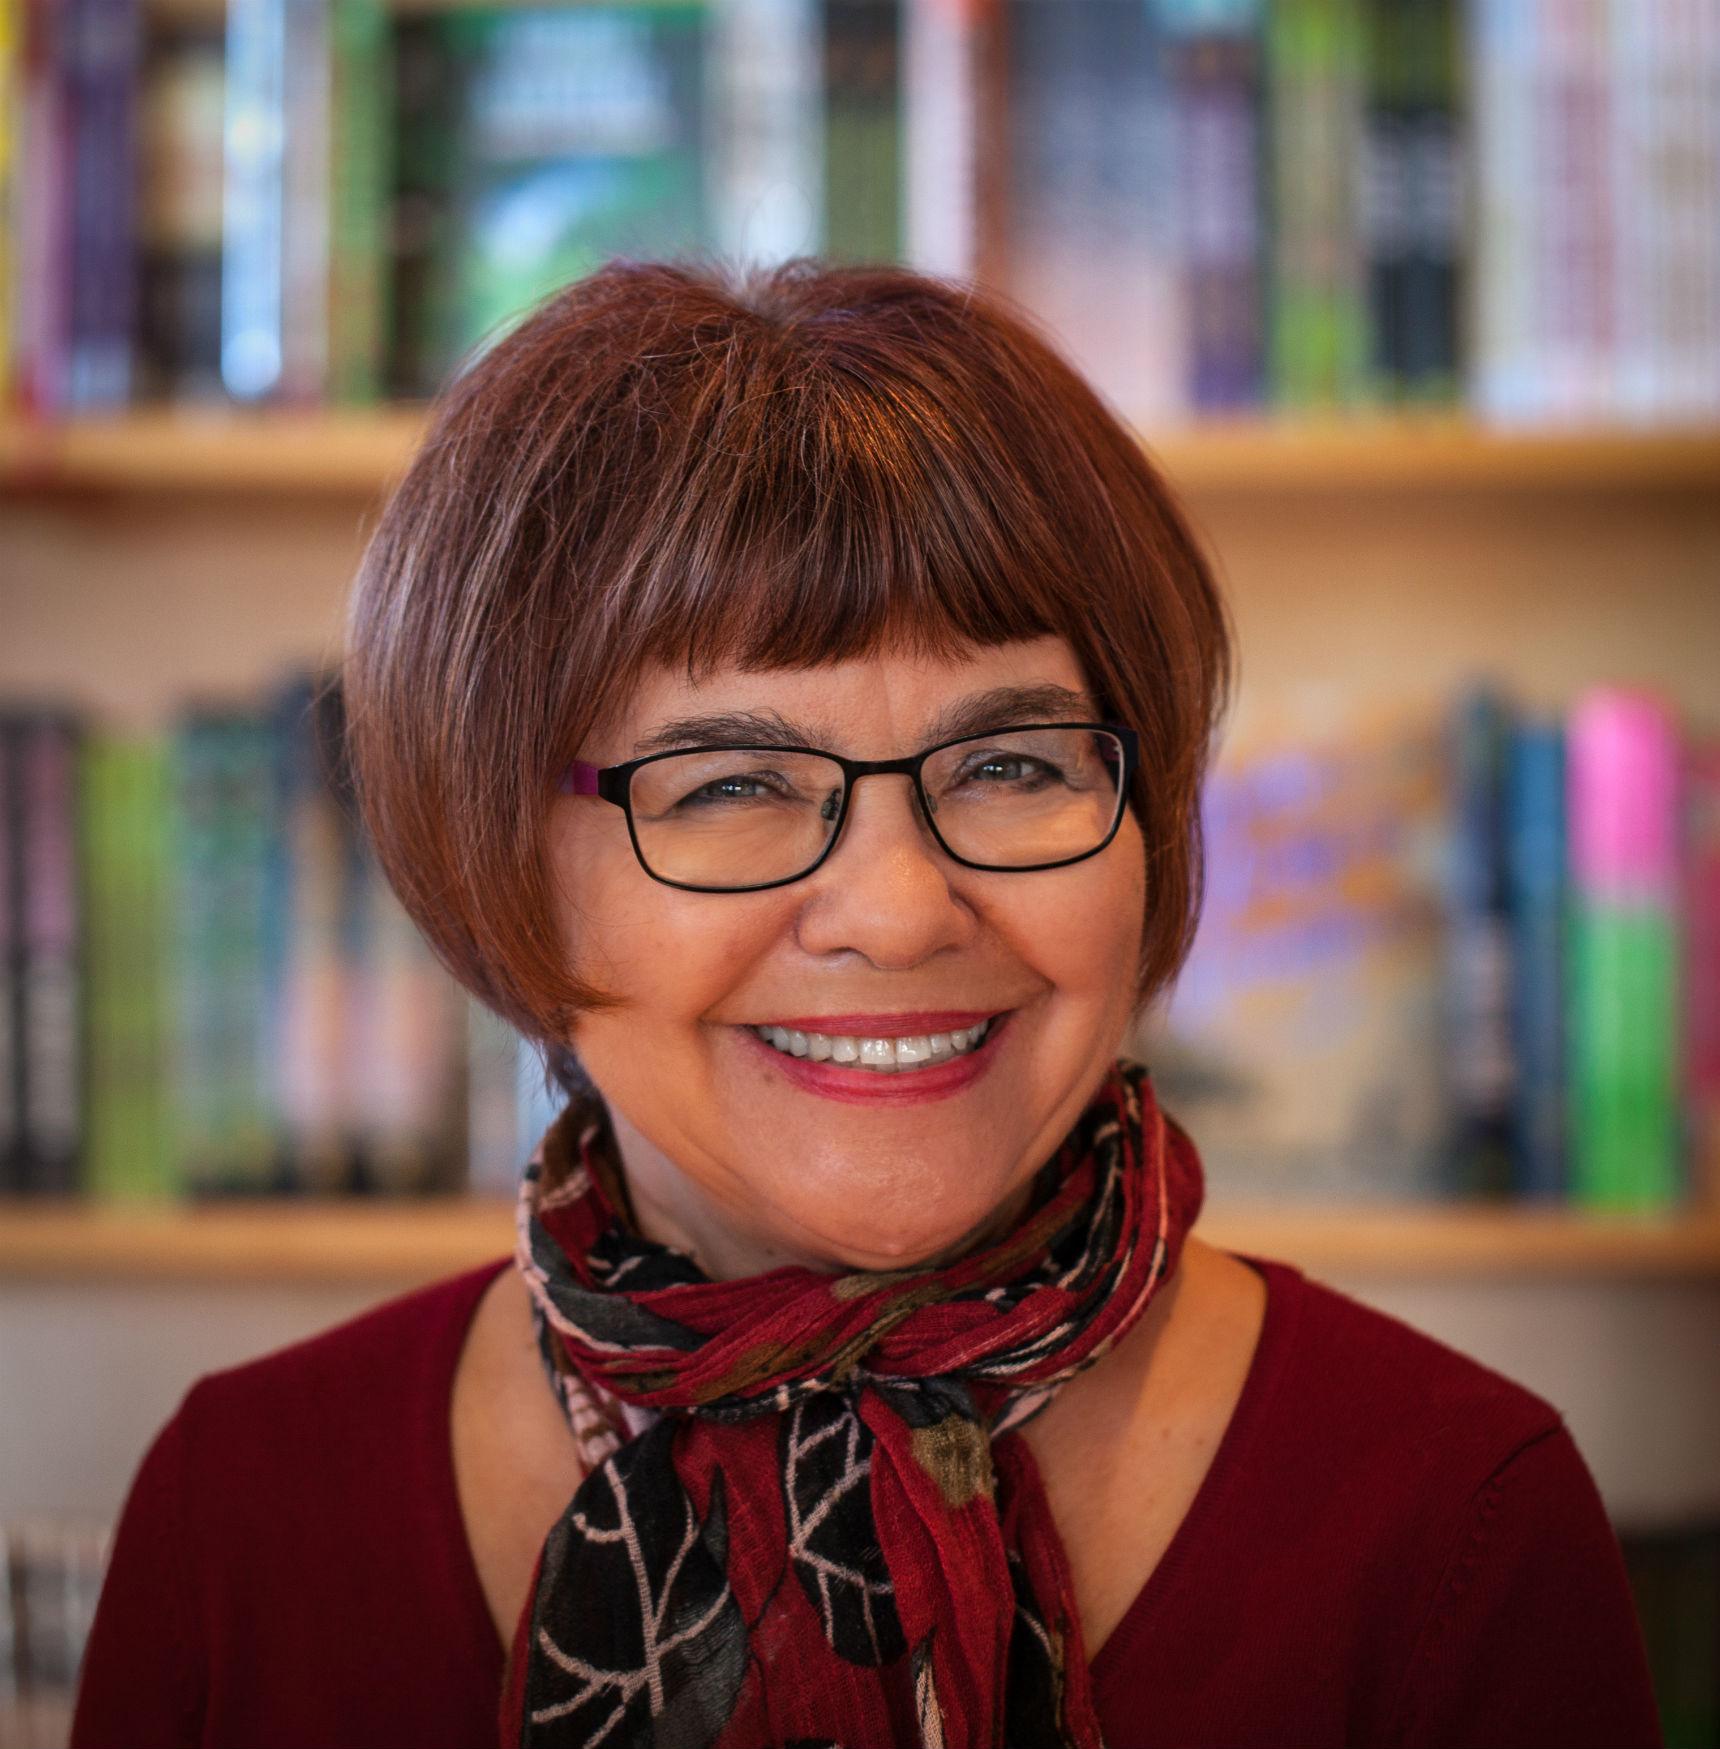 Darlene Foster, a children's author, picture